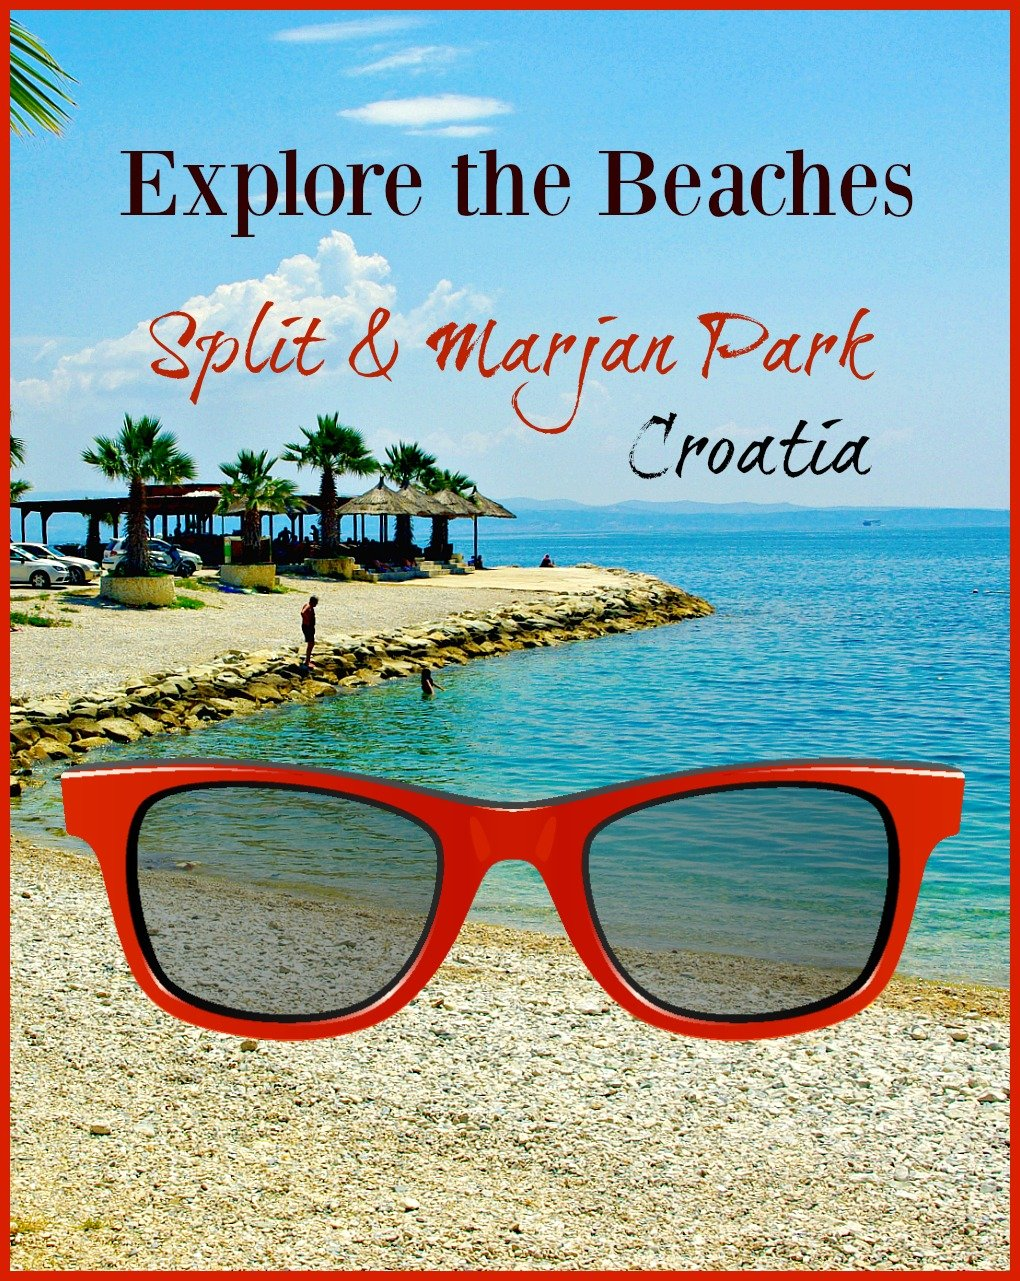 Explore the Beaches of Split and Marjan Park Croatia